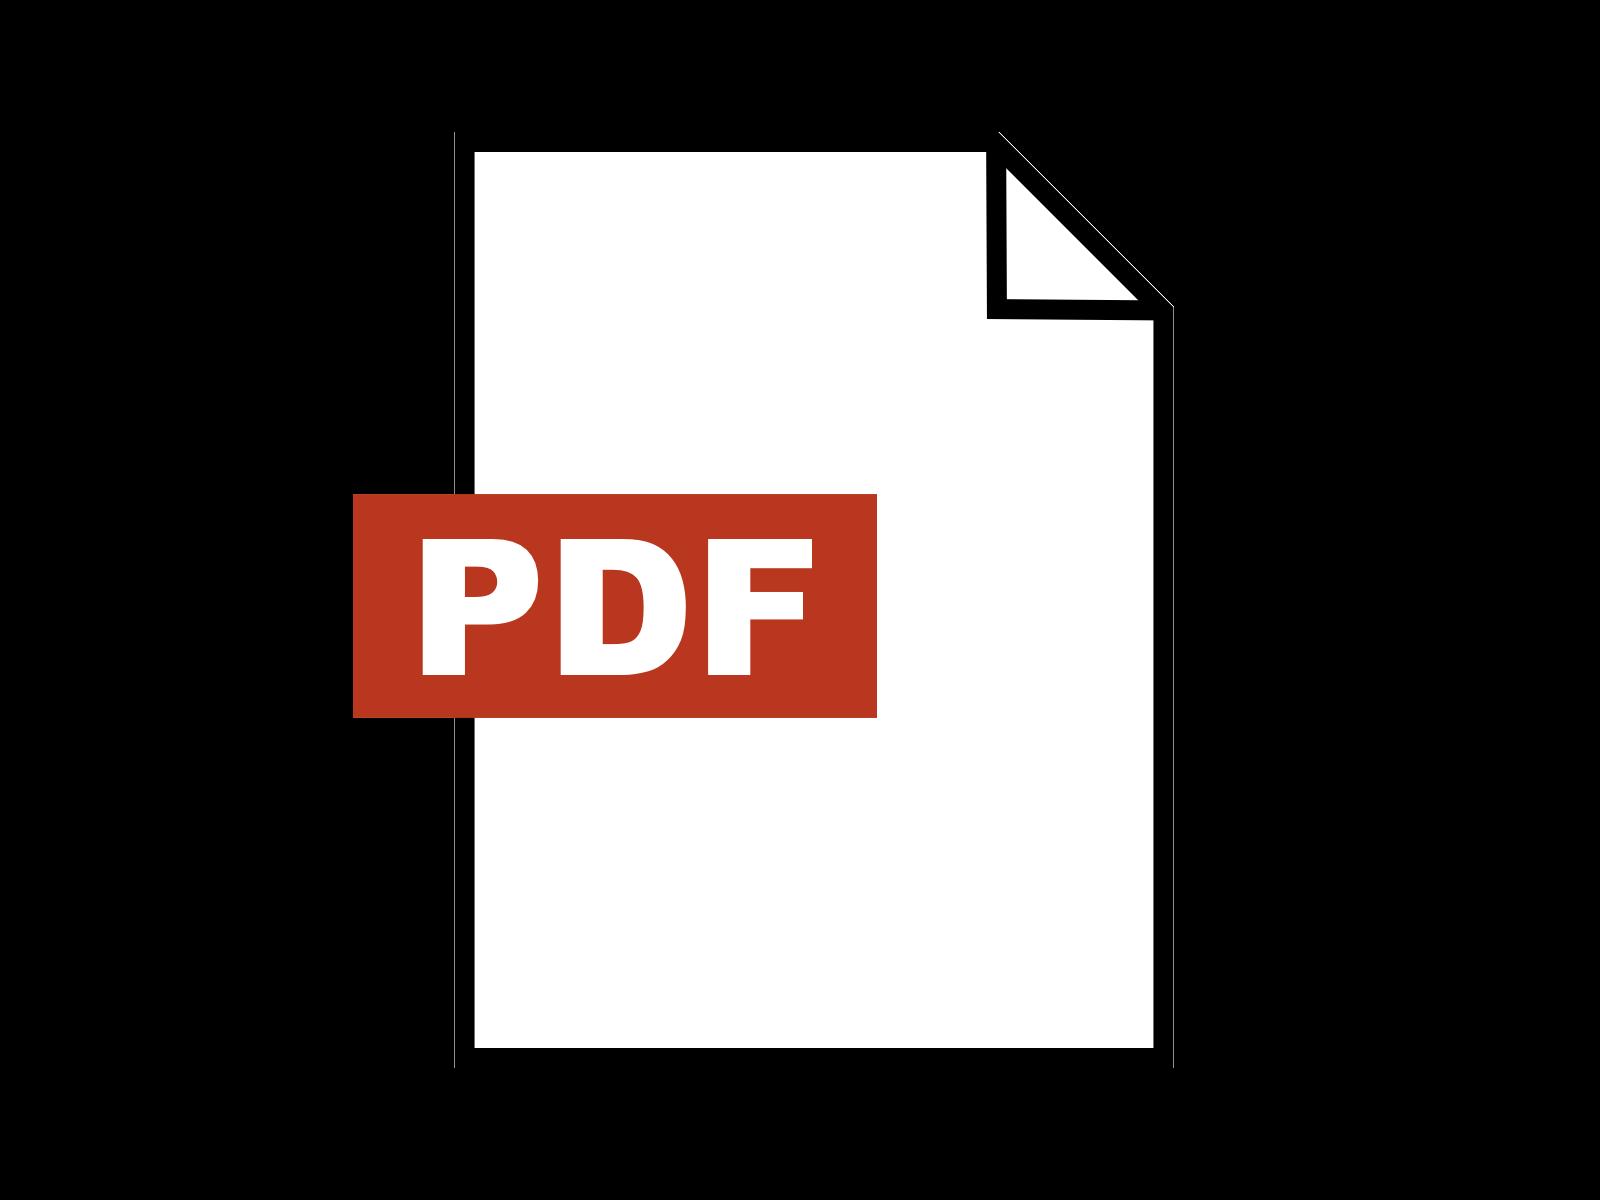 e-文書法と電子帳簿保存法について